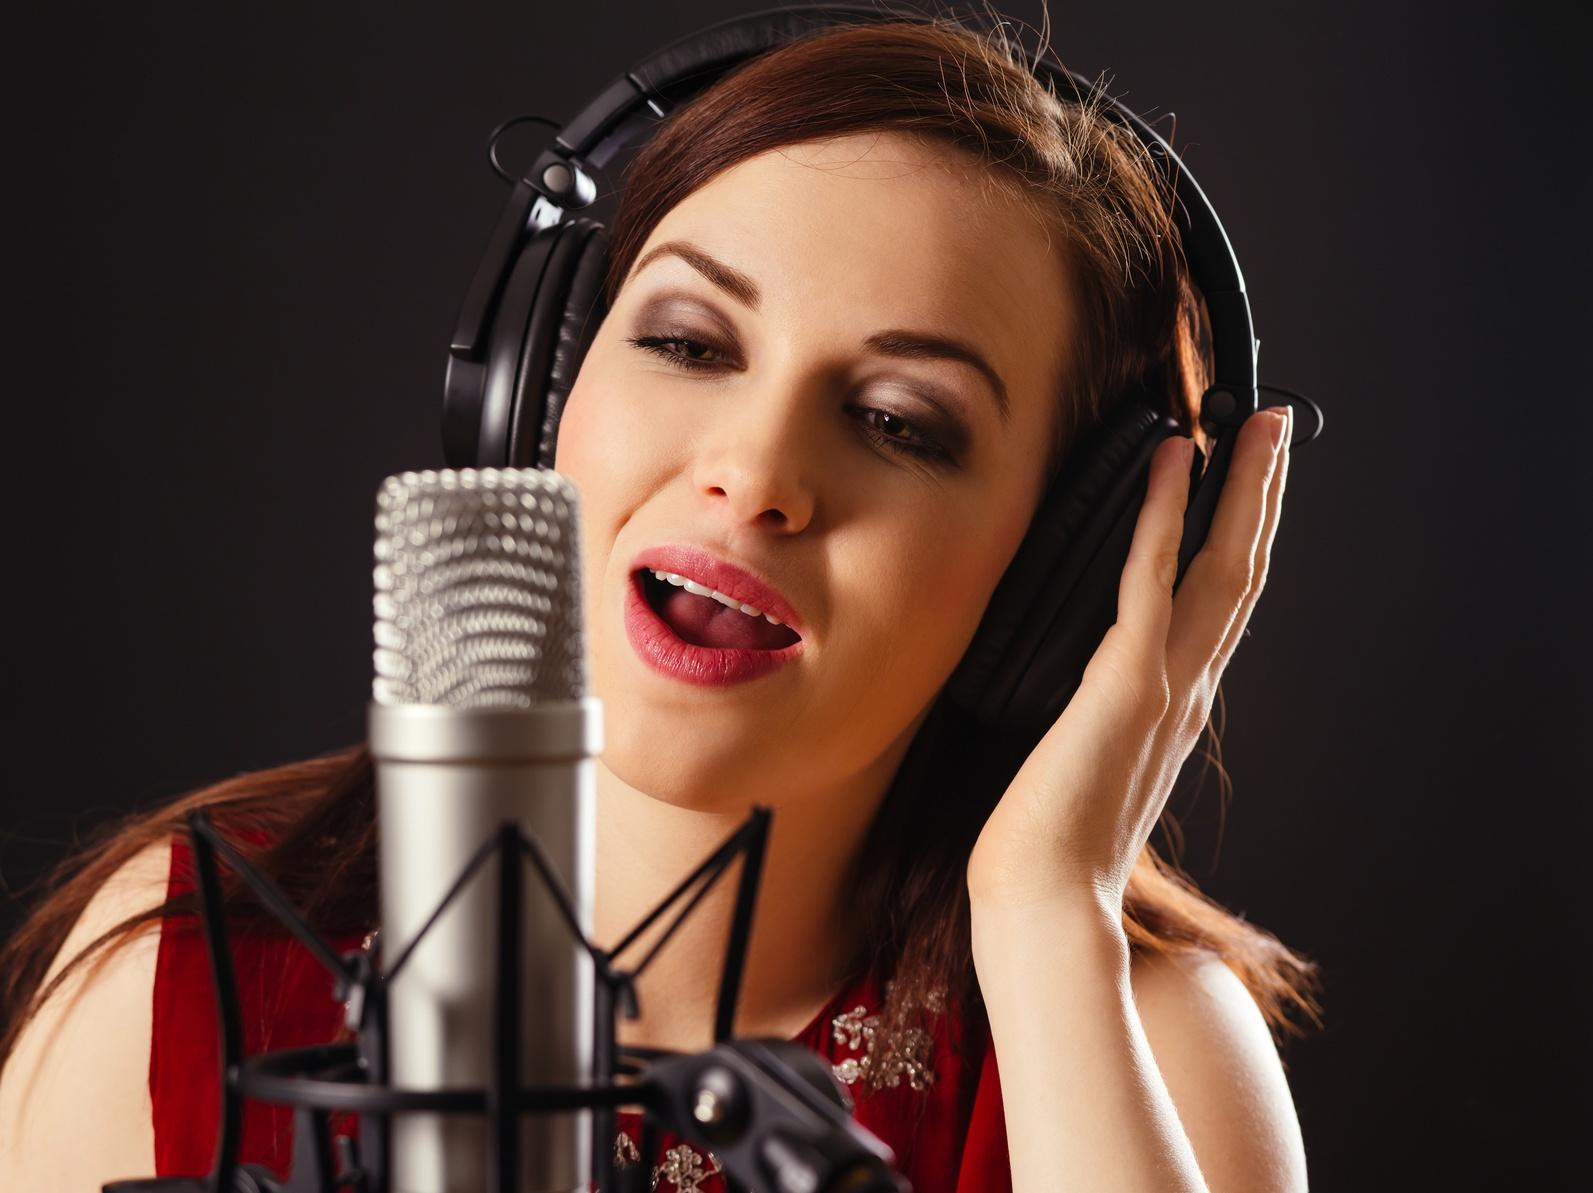 Female Voice Talent Recording Voice Over Track